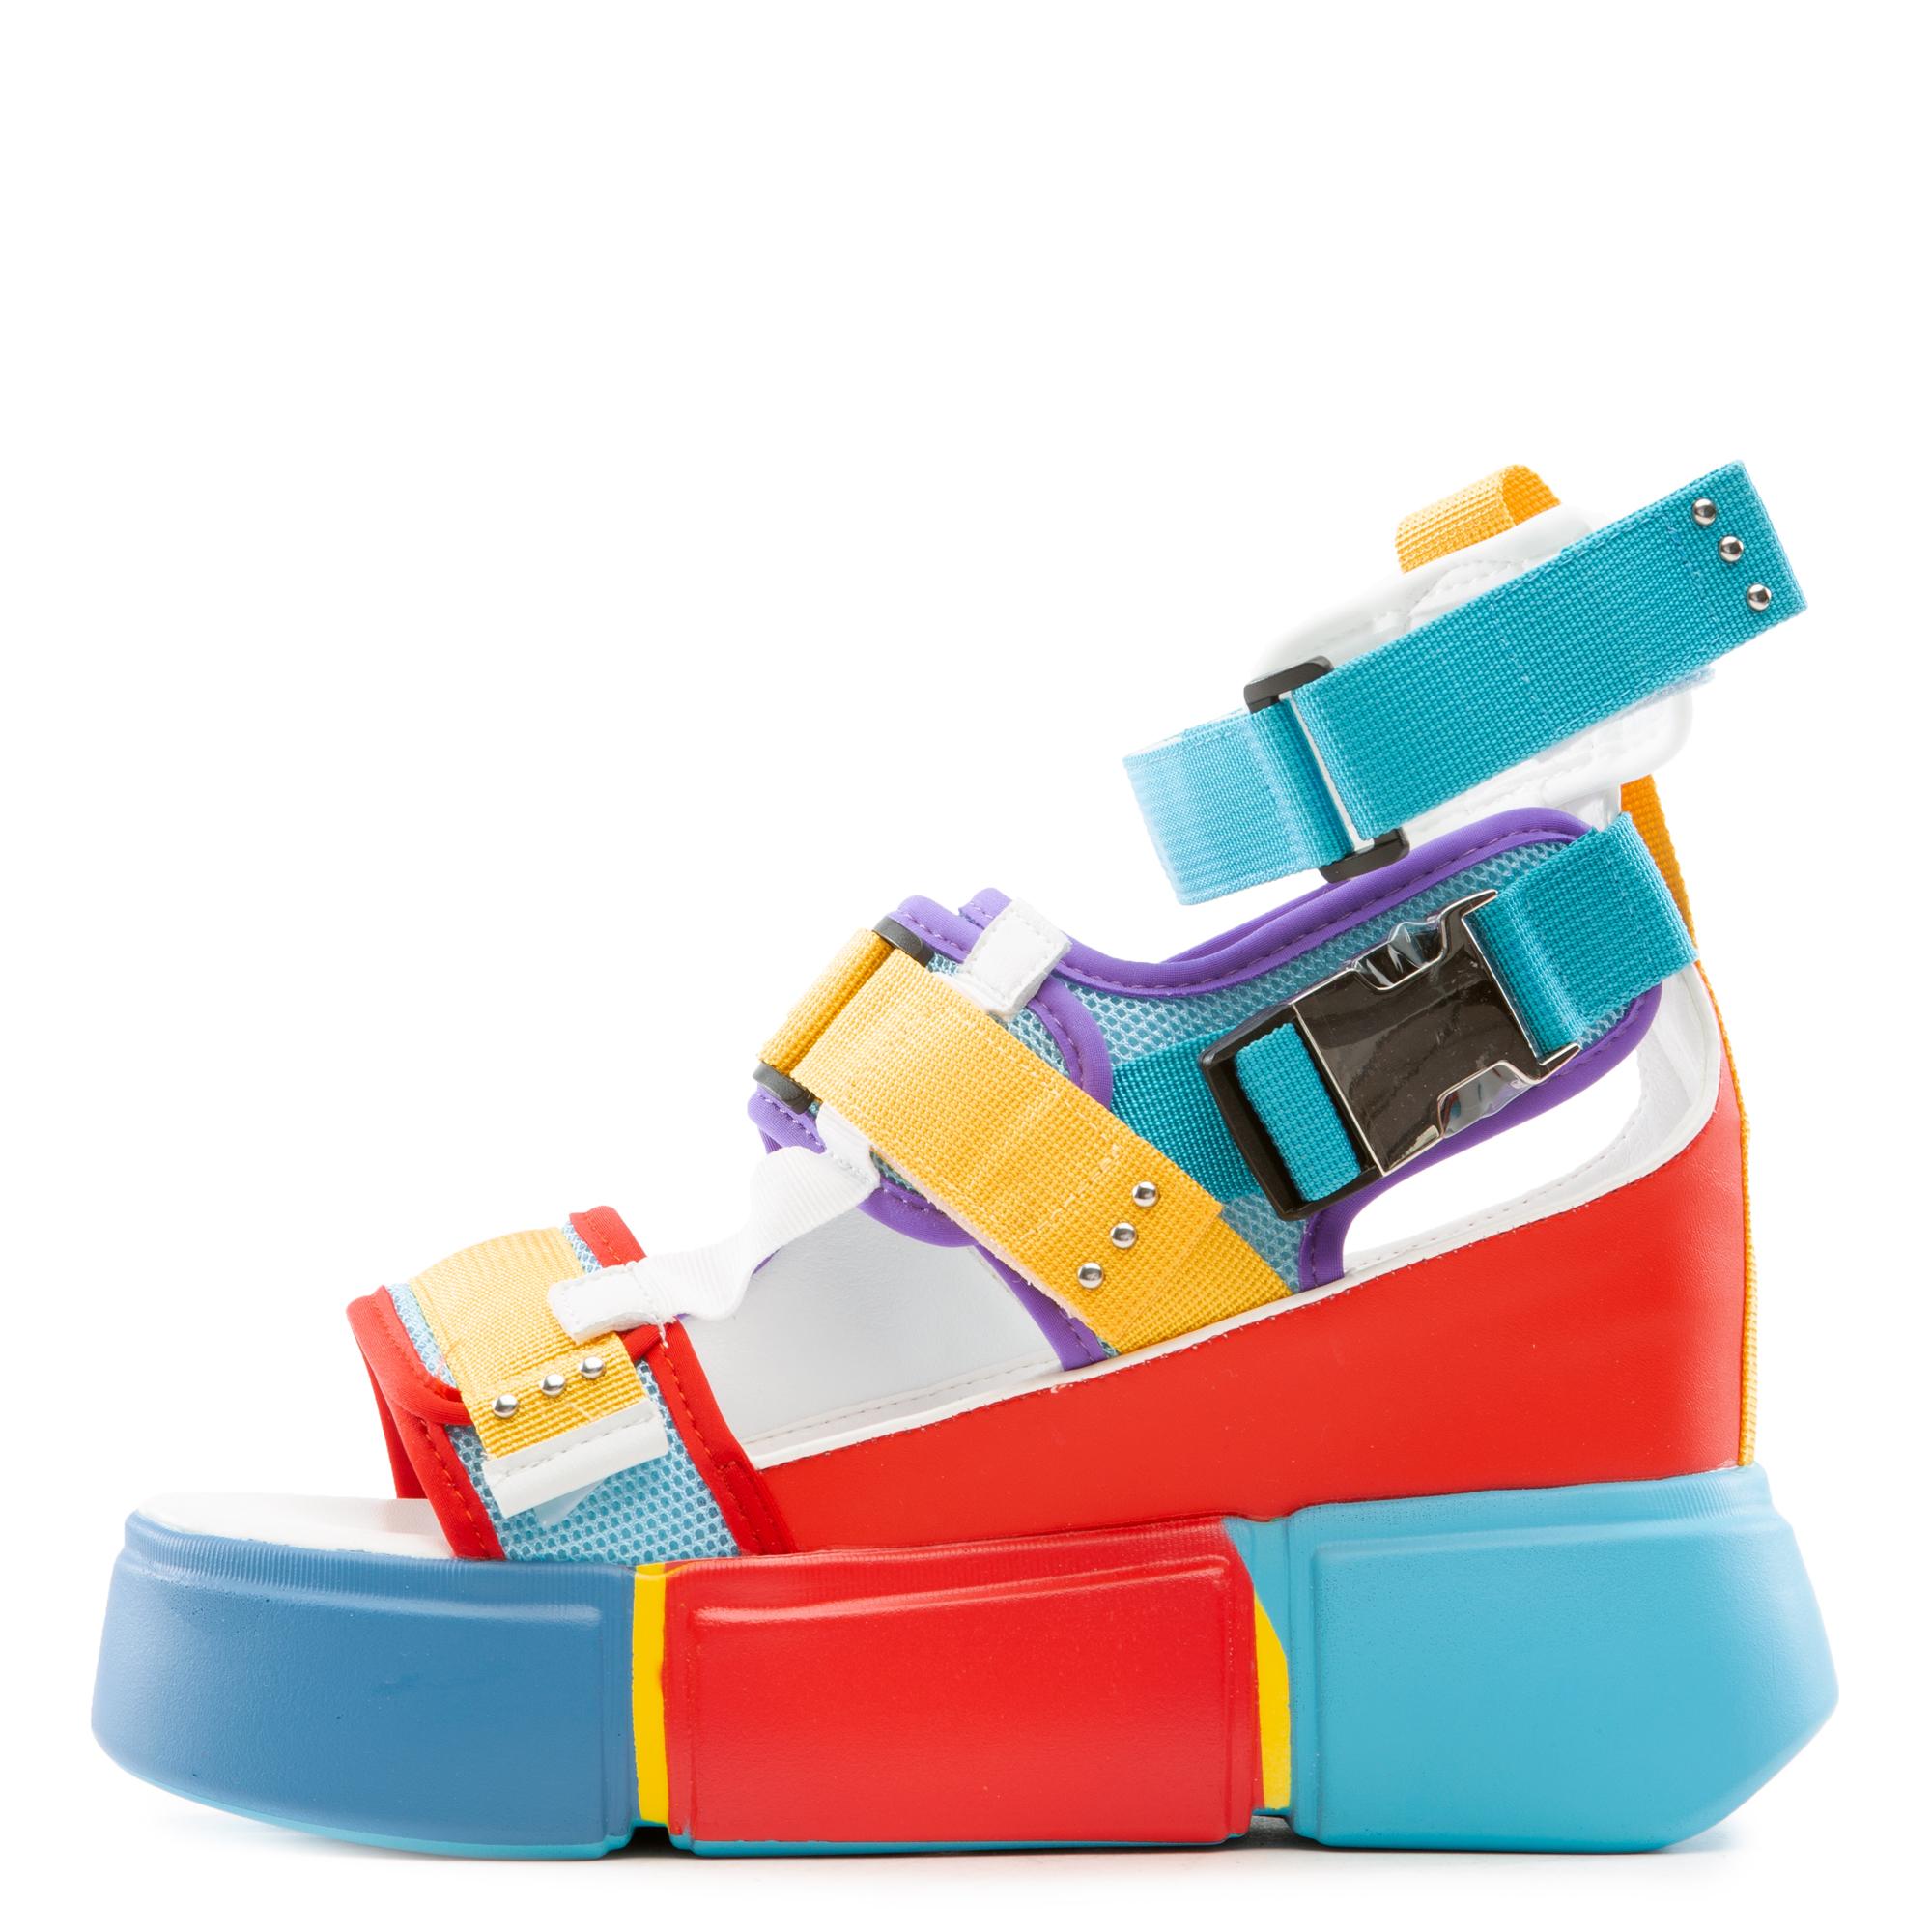 Cranberry-02 Platform Sandals